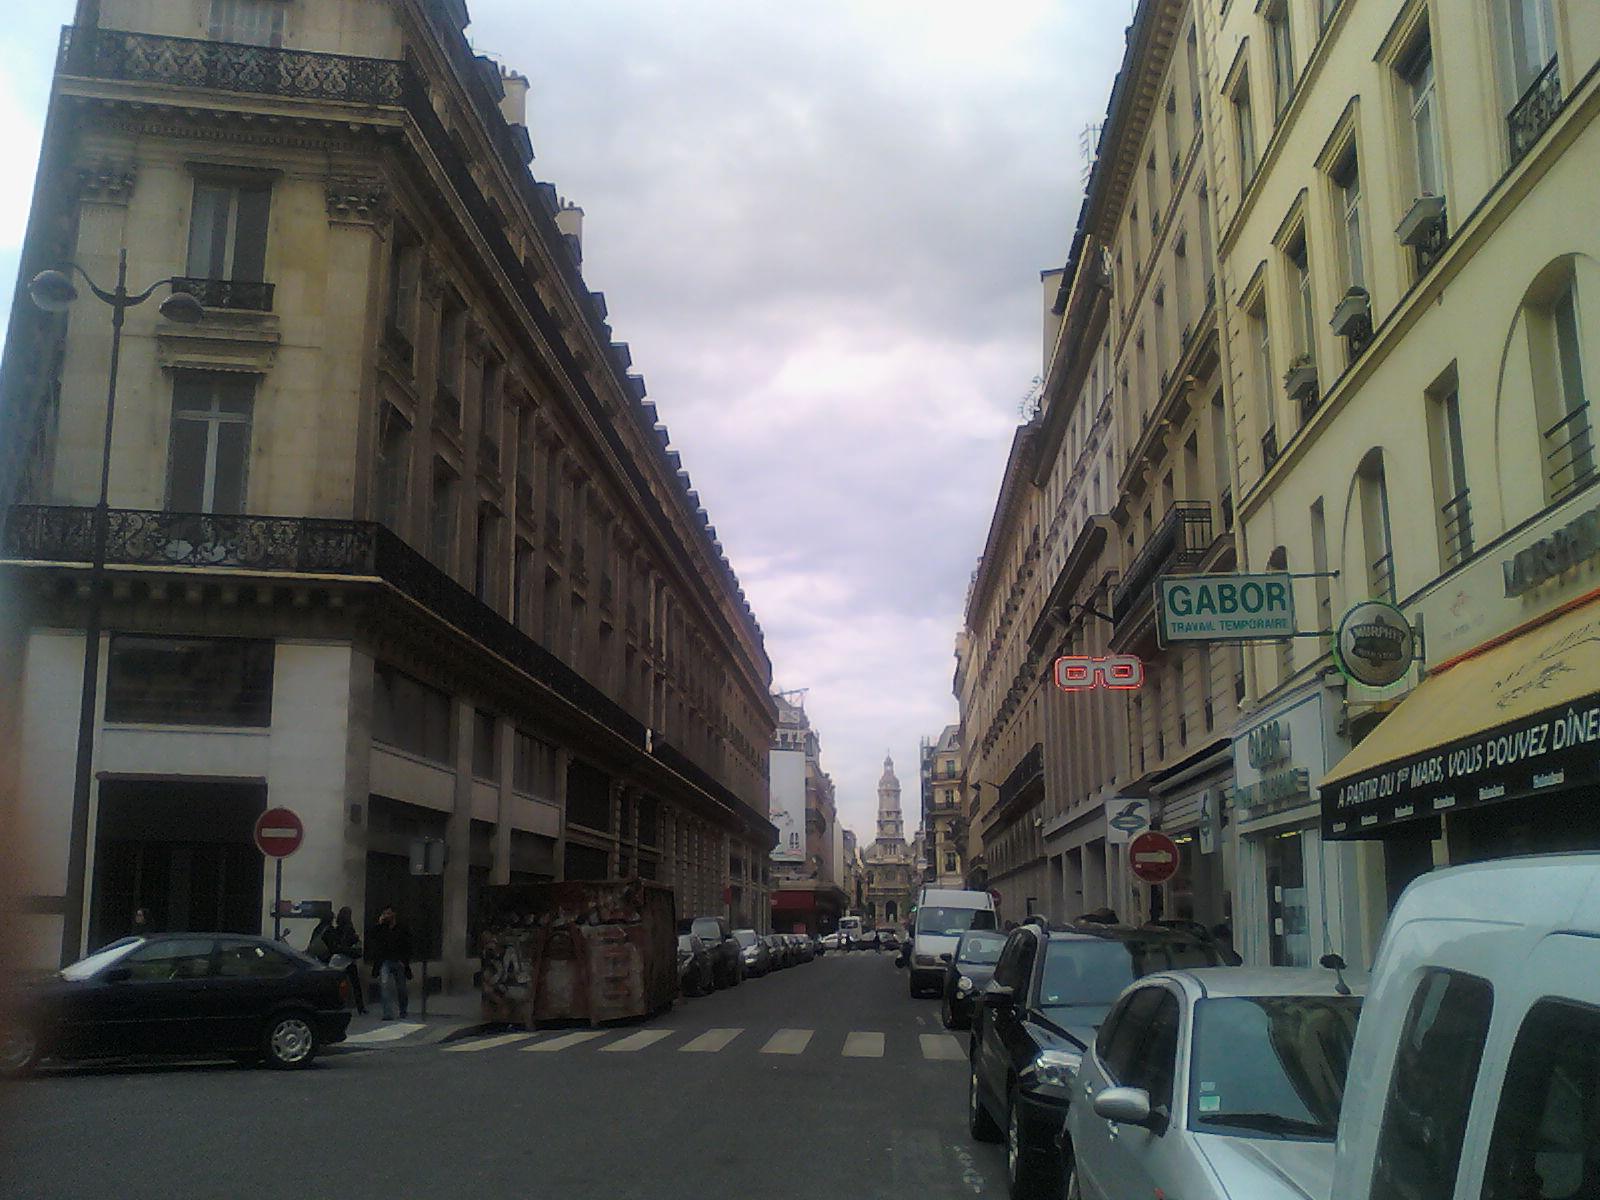 Rue de la Chaussée-d'Antin - Wikipedia